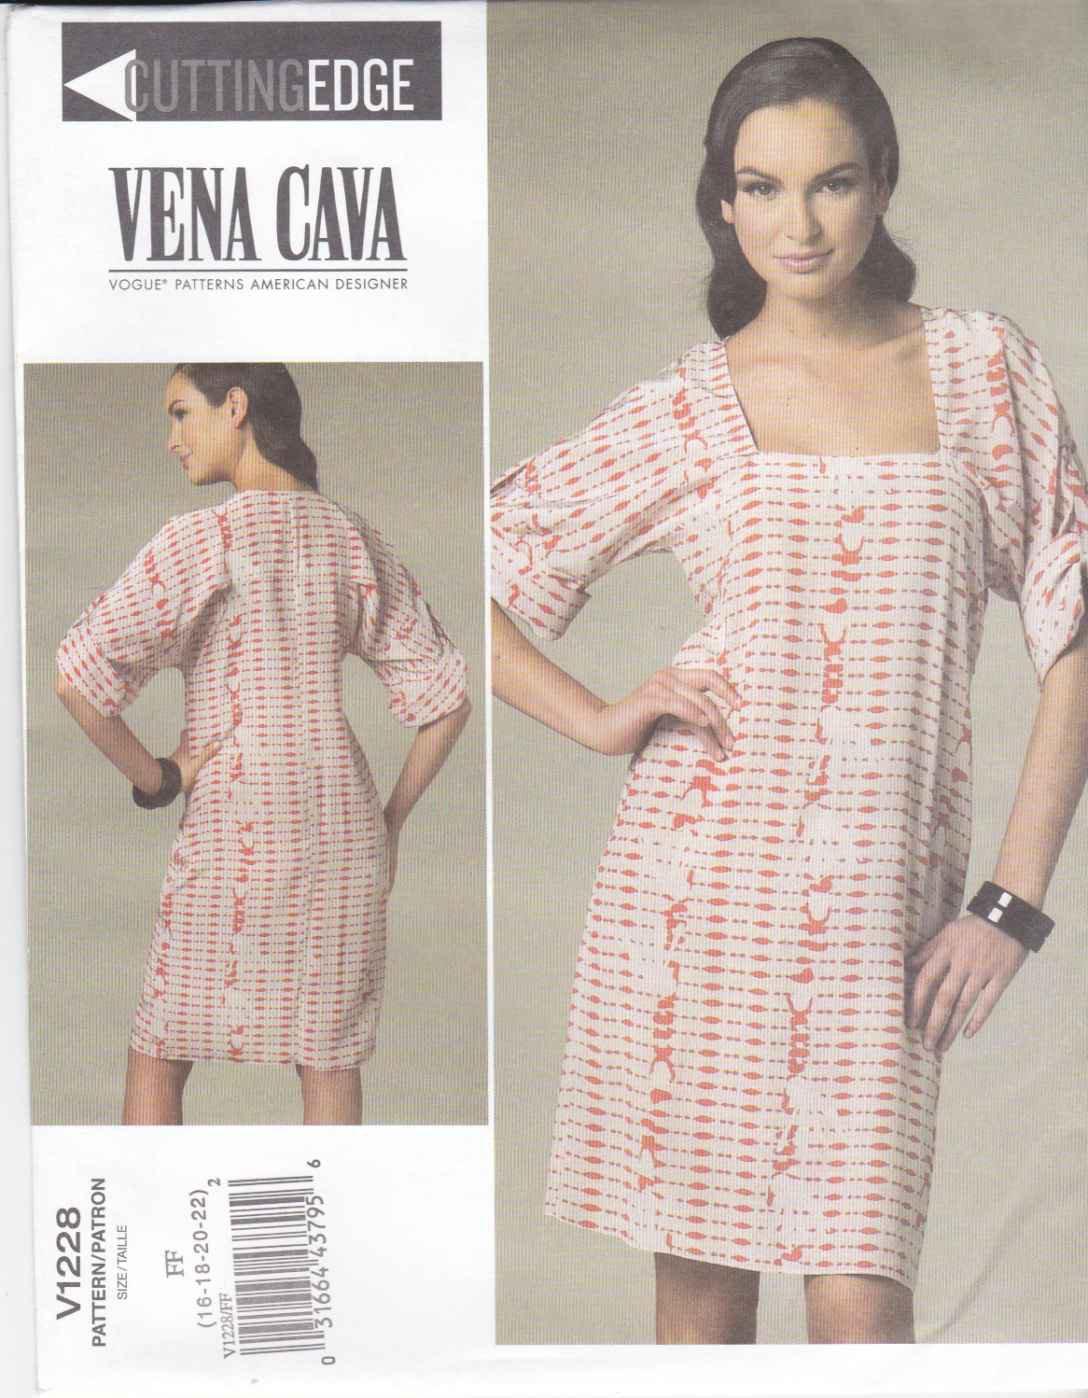 Vogue Sewing Pattern 1228 V1228 Misses Size 8-14 Easy Vena Cava Pullover Dress Kimono Sleeves